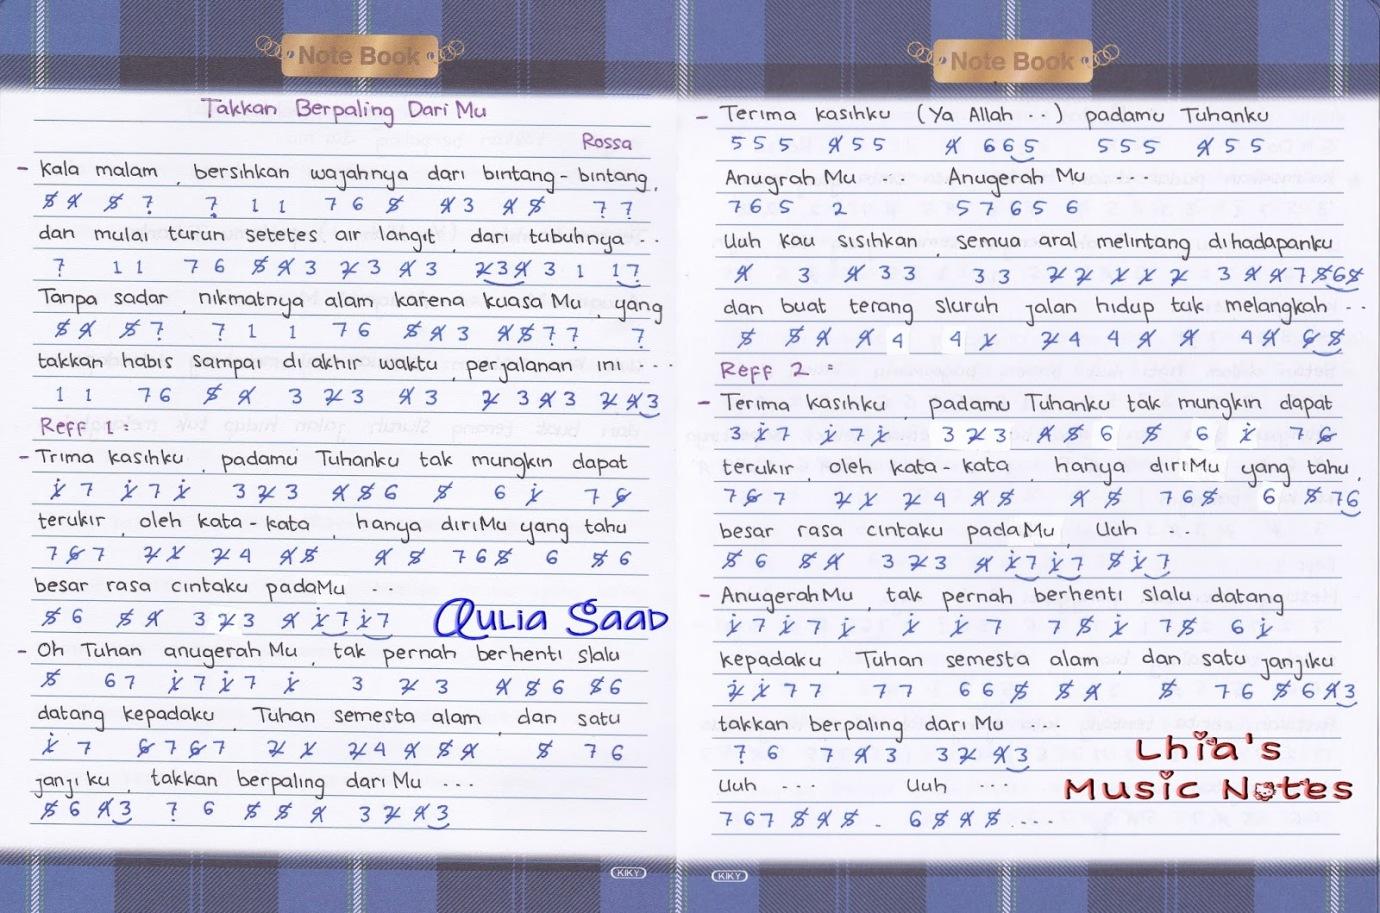 Not Angka Lagu Religi Lhia S Music Notes